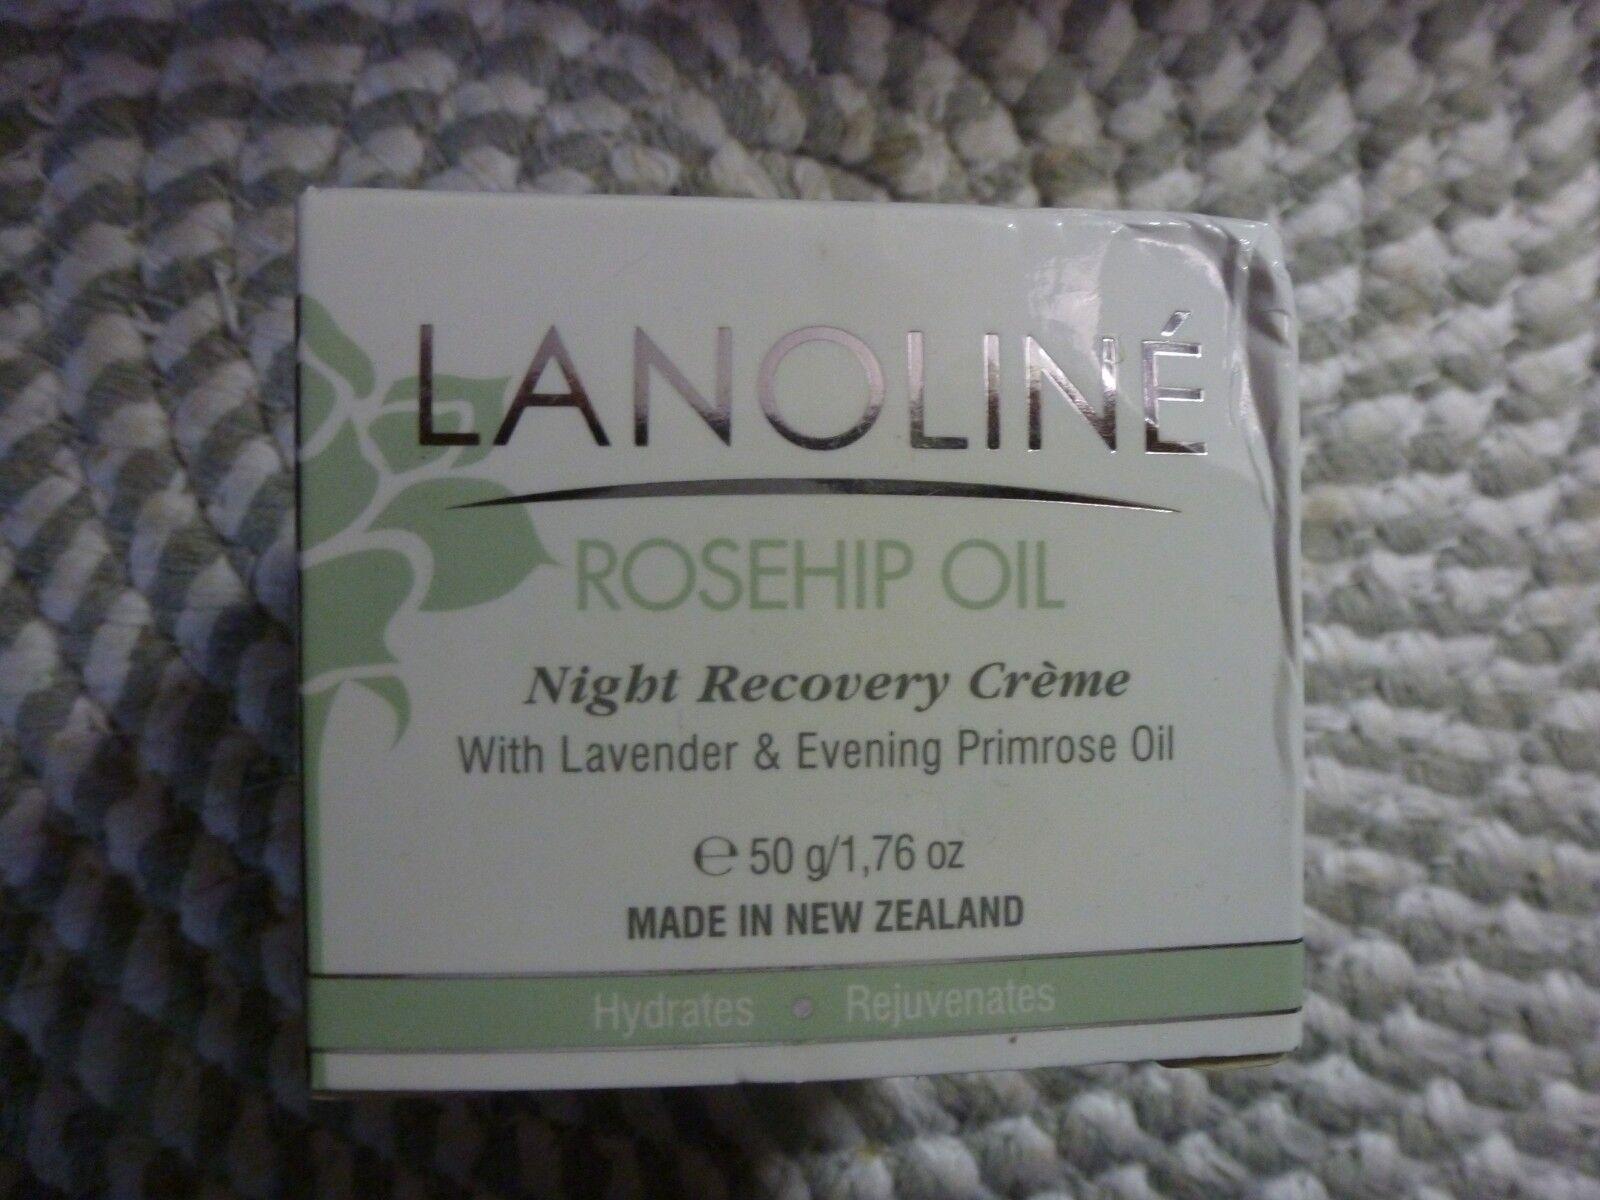 Lanoline Rosehip Oil Night Recovery Creme - Hydrating Cream